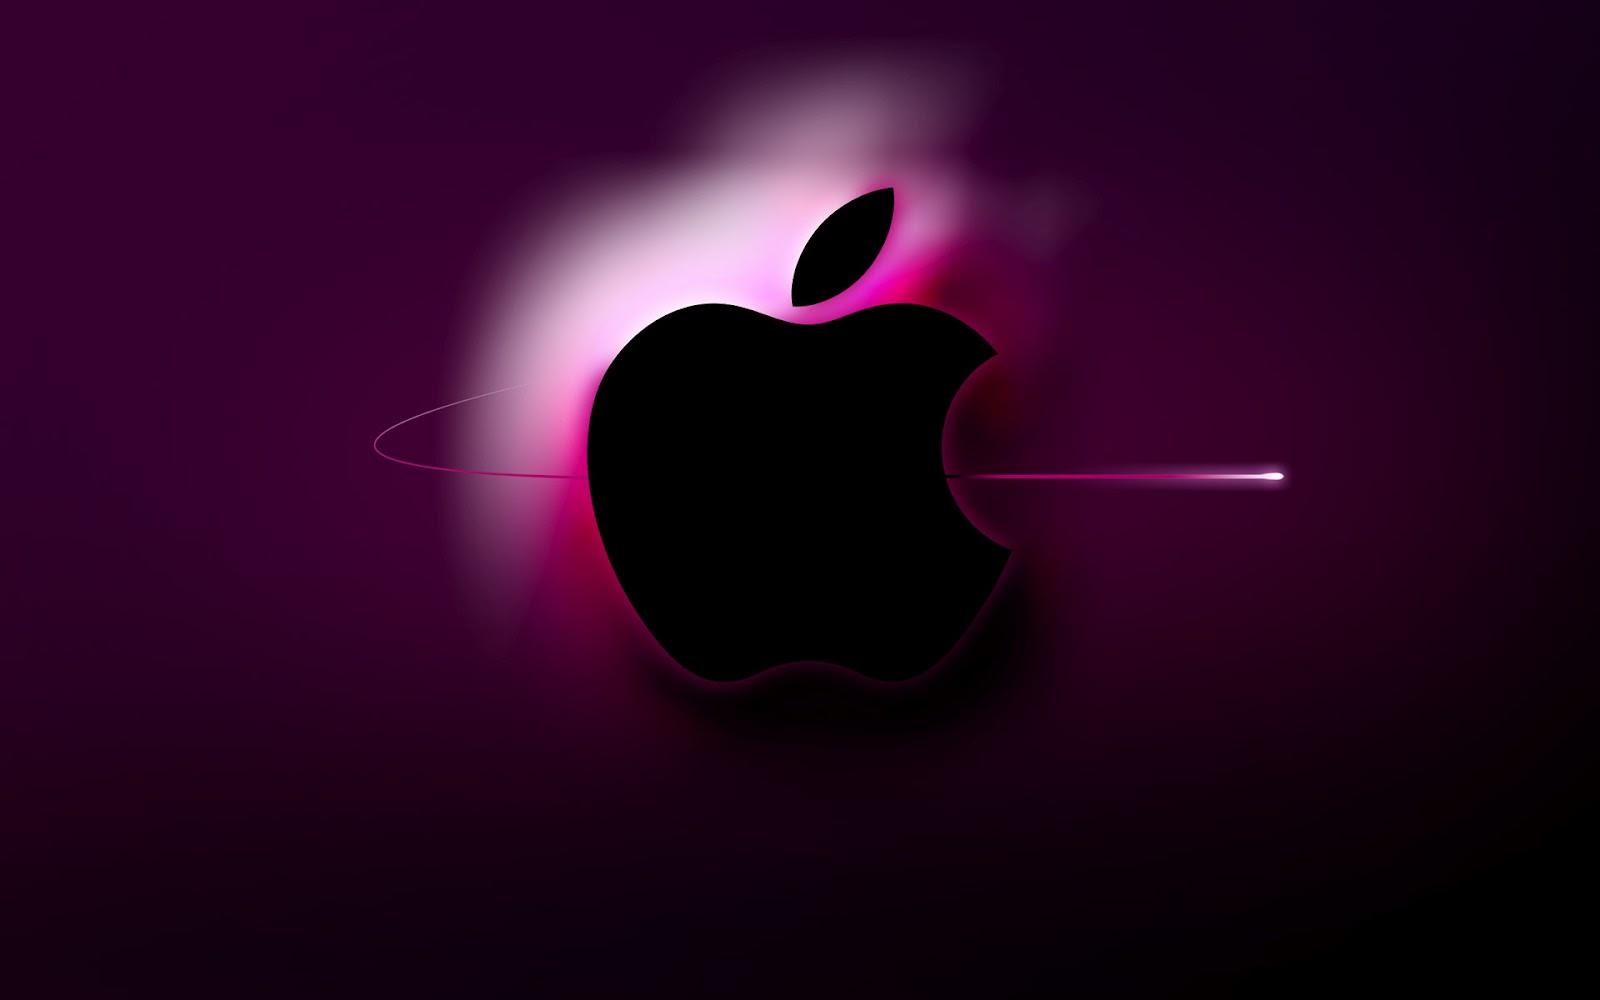 apple iphone wallpapers apple iphone wallpapers apple iphone 1600x1000